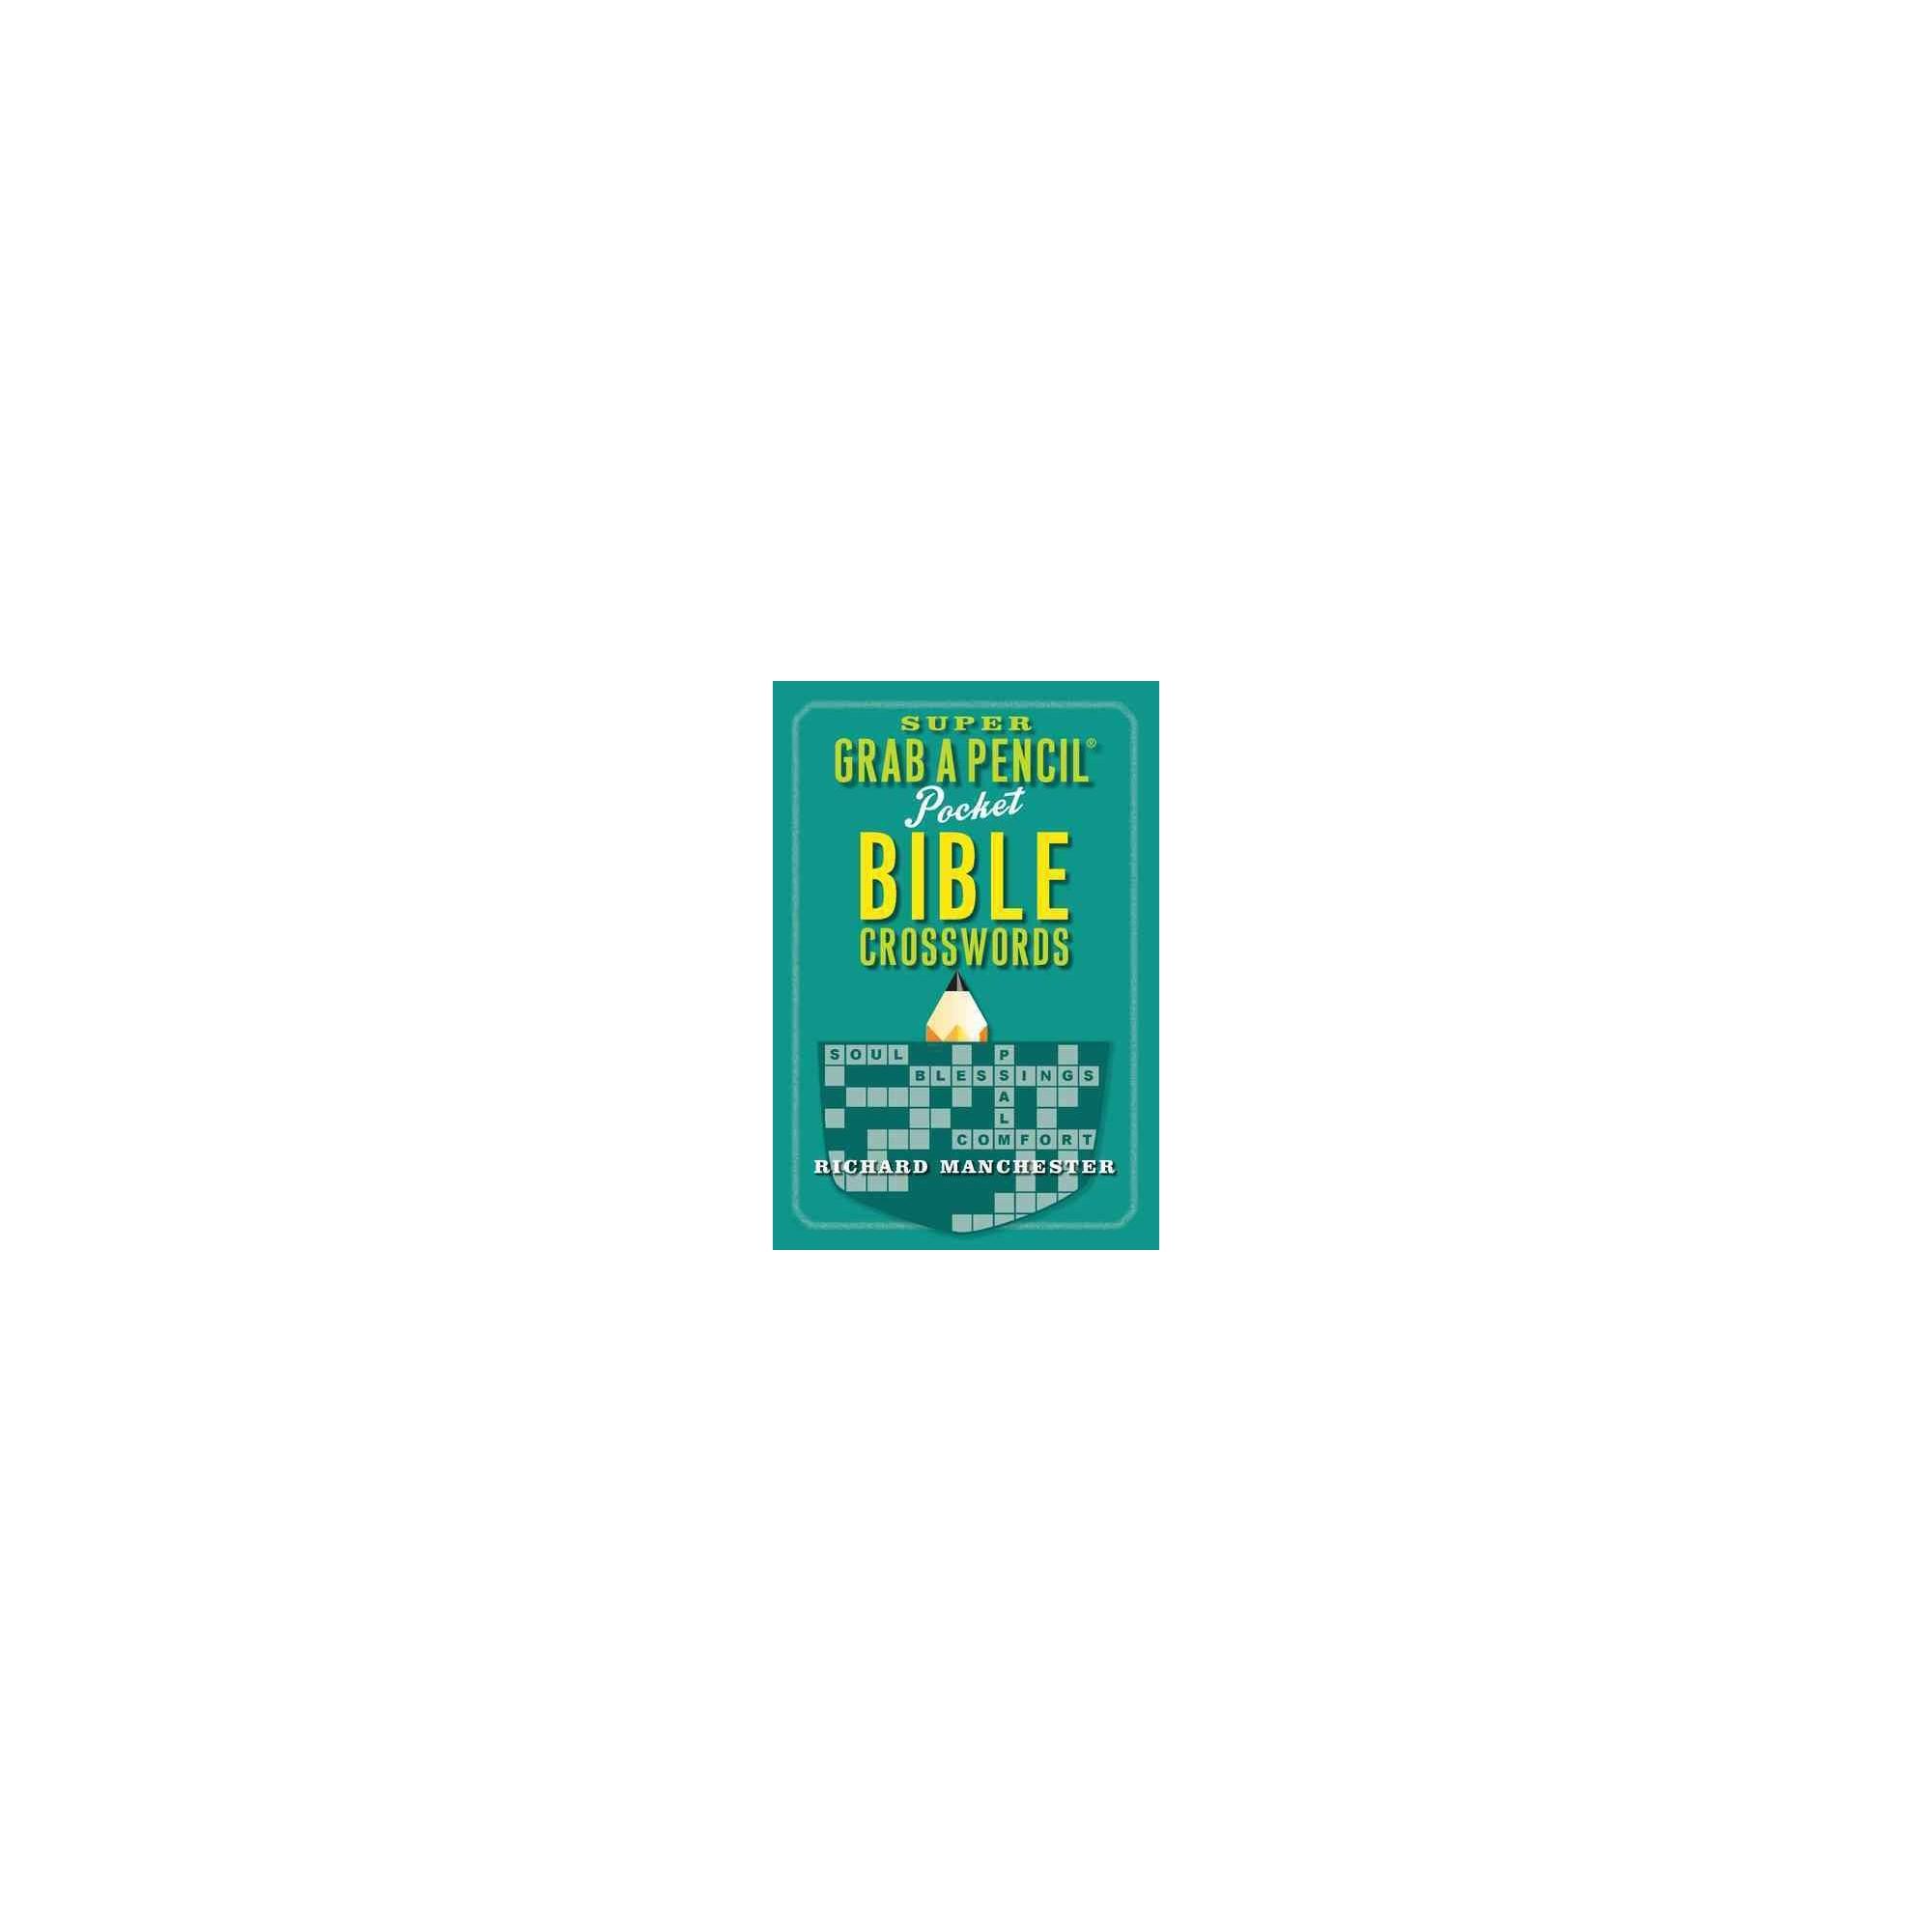 Super Grab a Pencil Pocket Bible Crosswords (Paperback) | Products ...